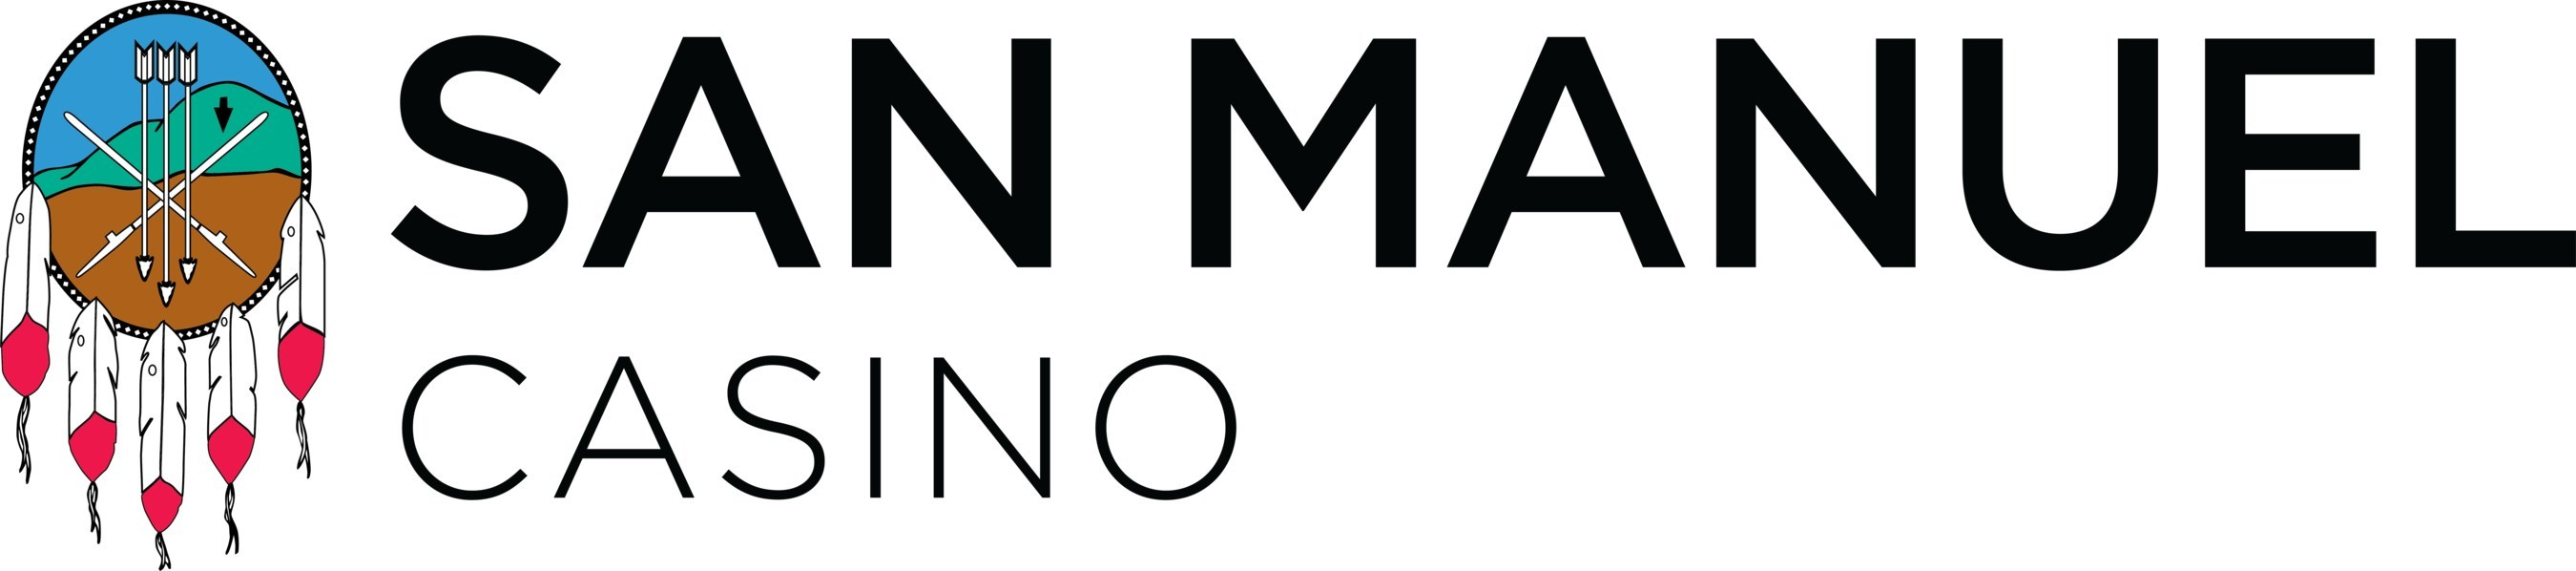 Casino Player Magazine Readers Name San Manuel Casino Best Vip Services